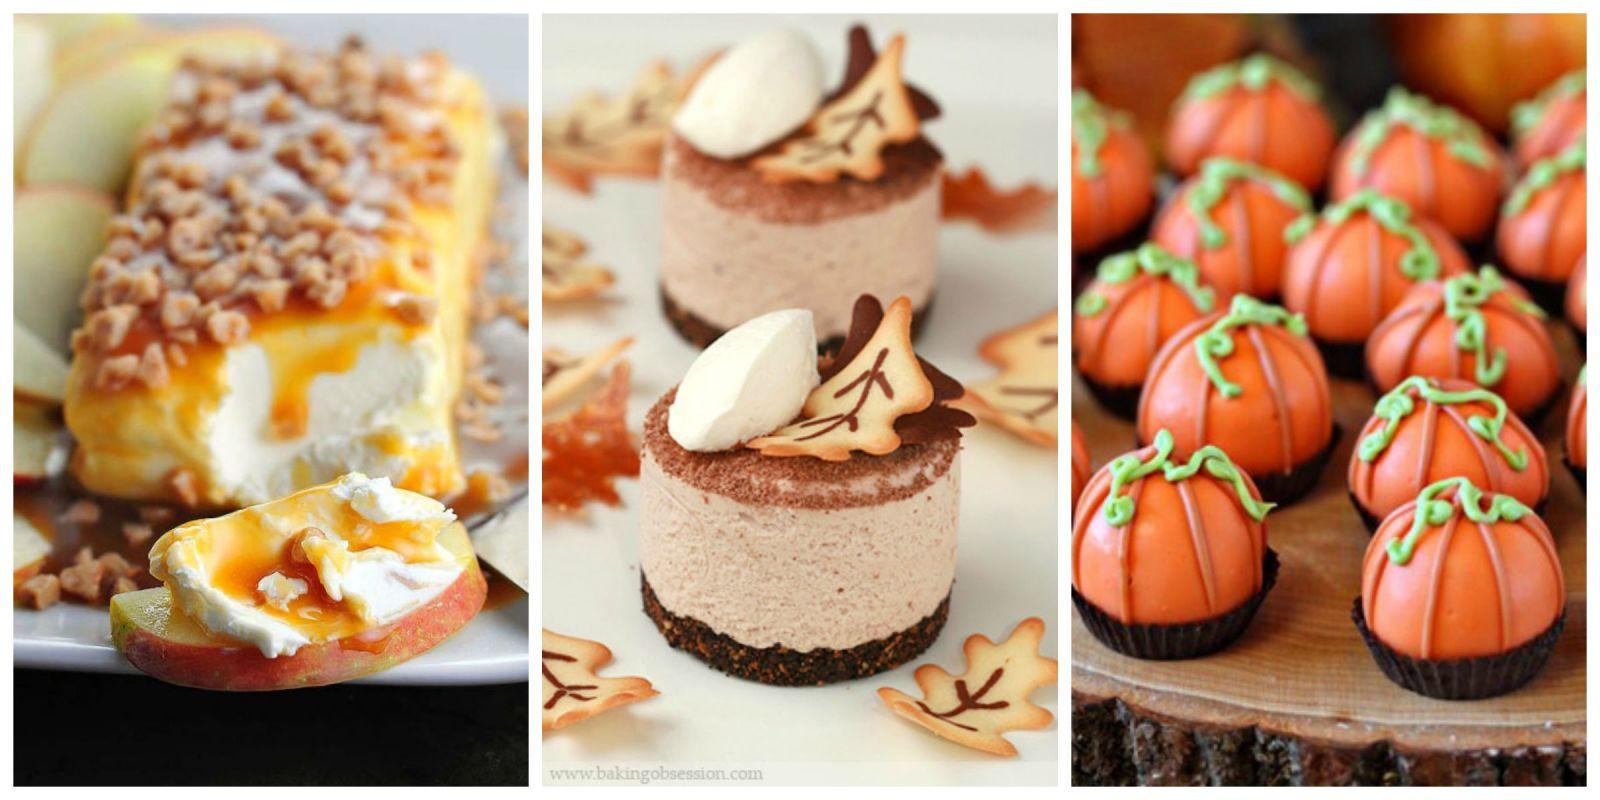 Fall Desserts Recipe  35 Easy Fall Dessert Recipes Best Treats for Autumn Parties